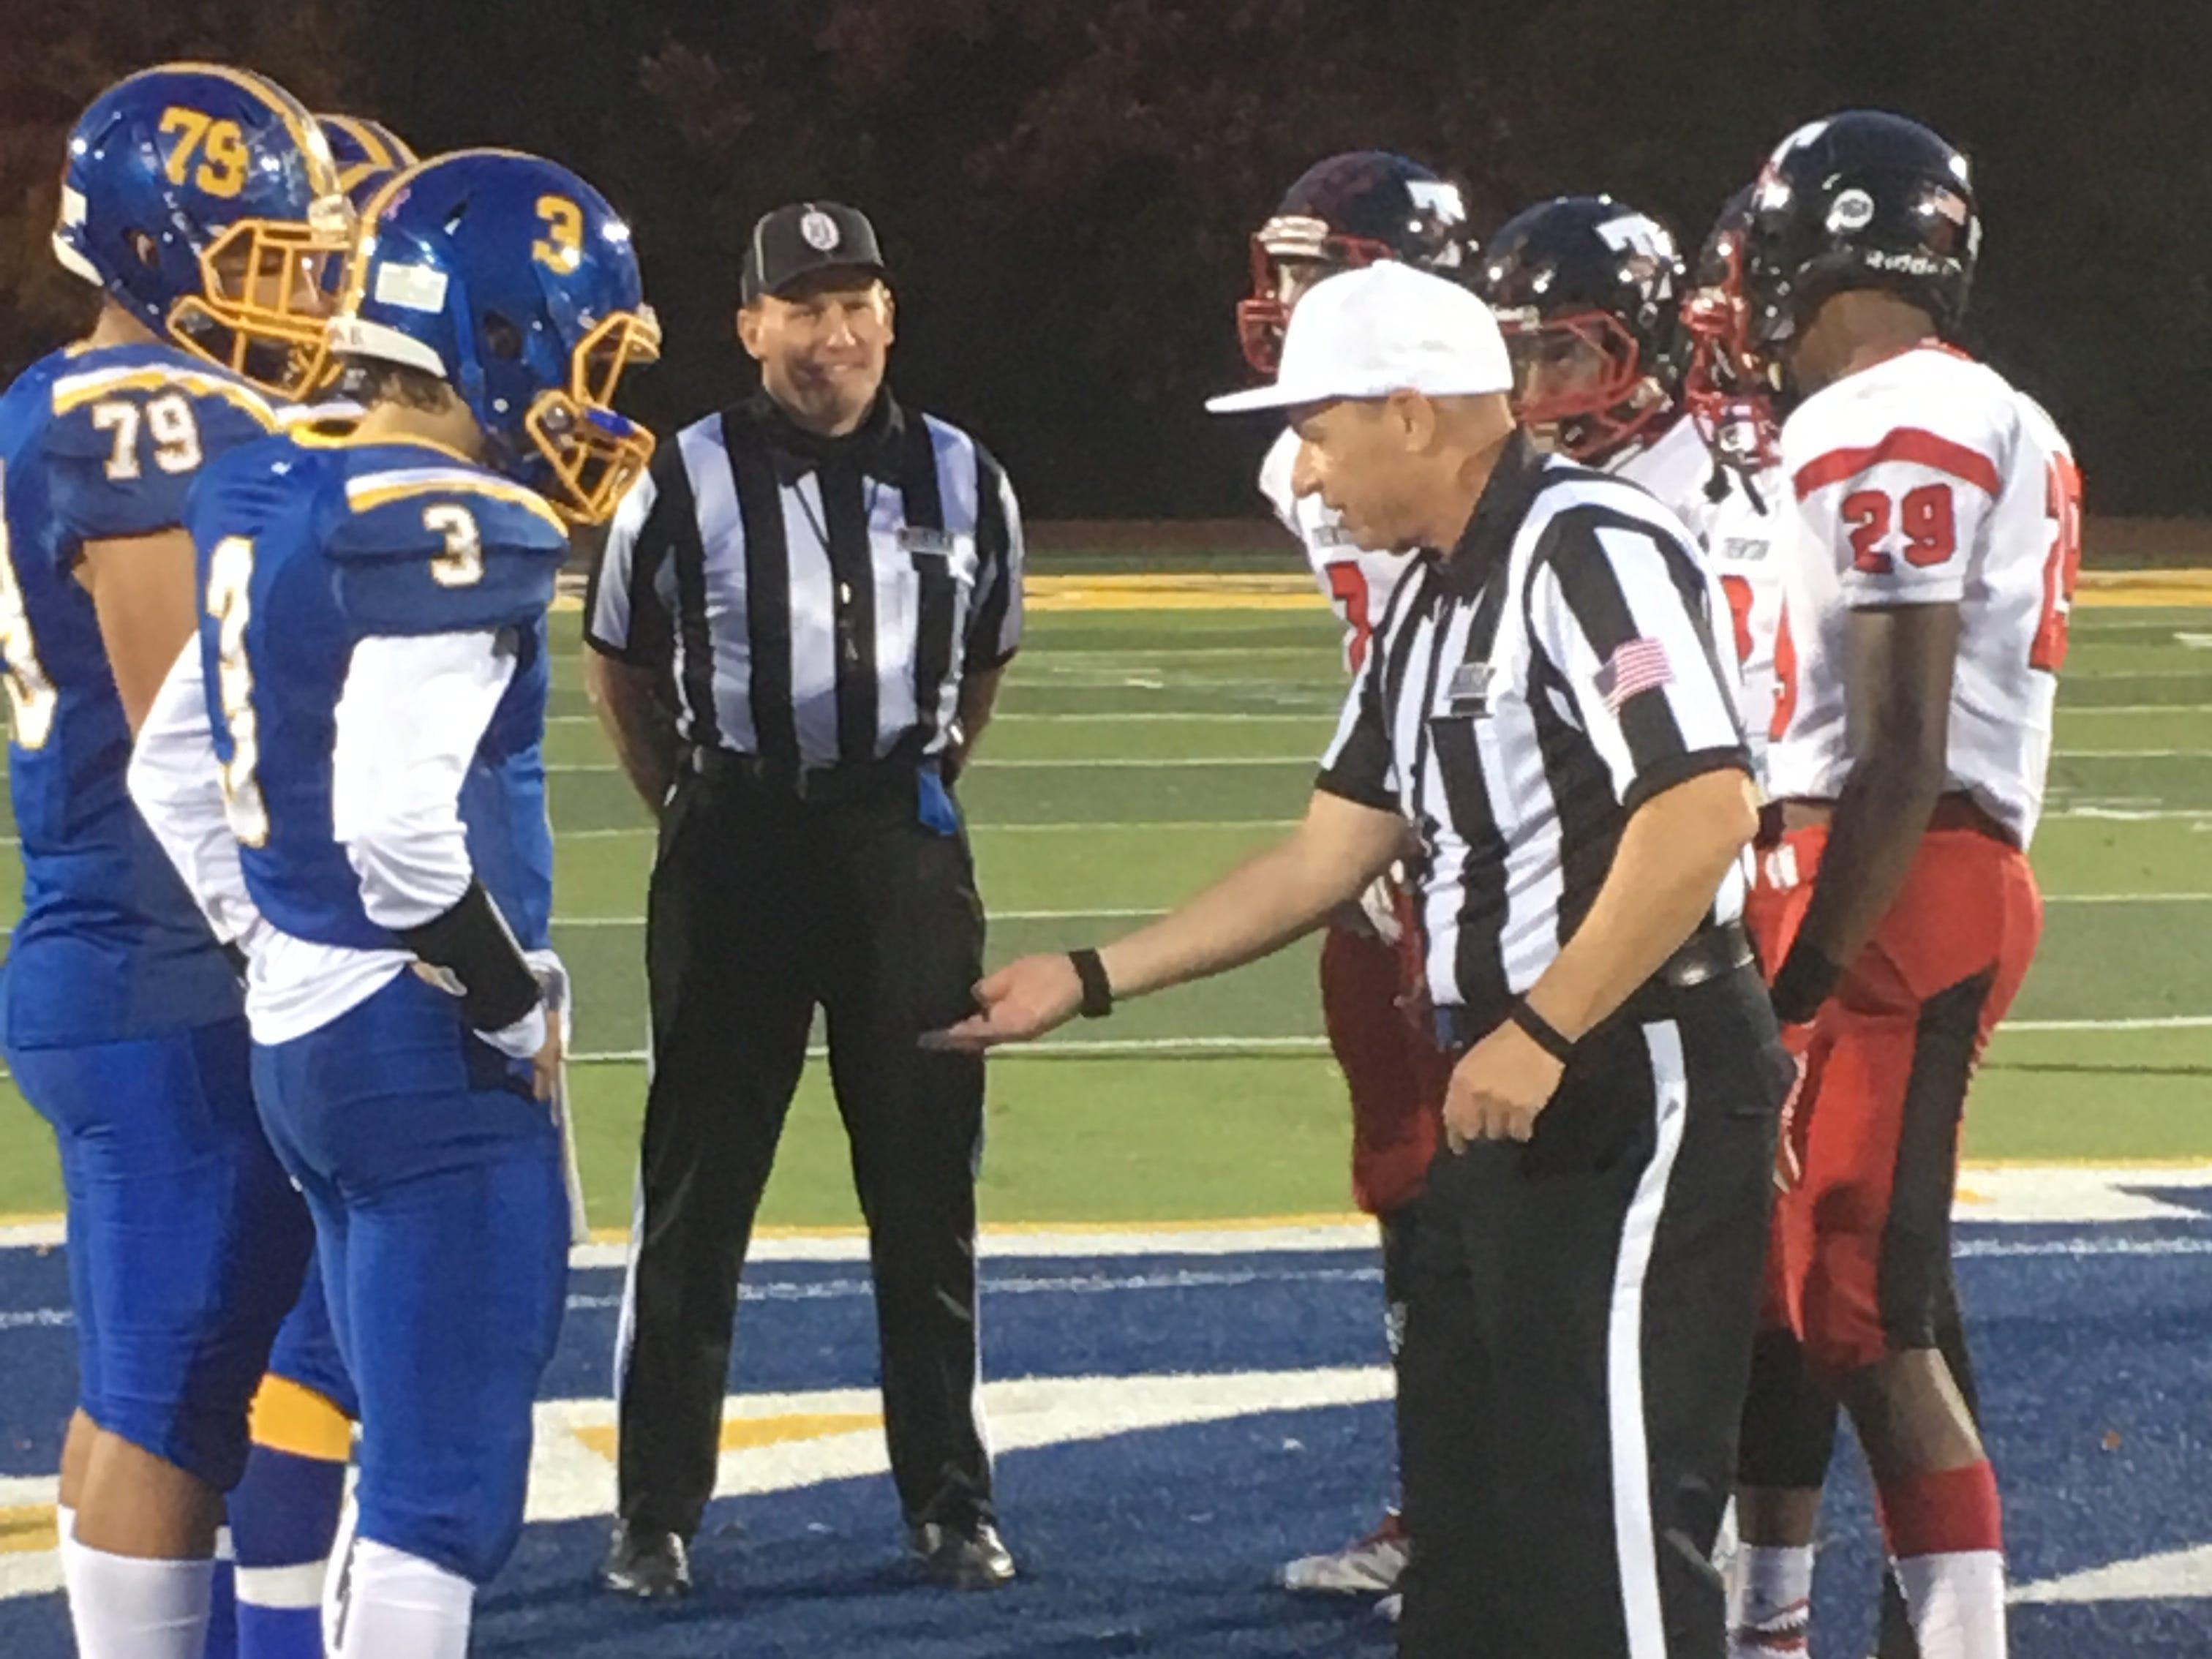 Trenton at North Brunswick football in Central Group V first round on Friday, Nov. 2, 2018.